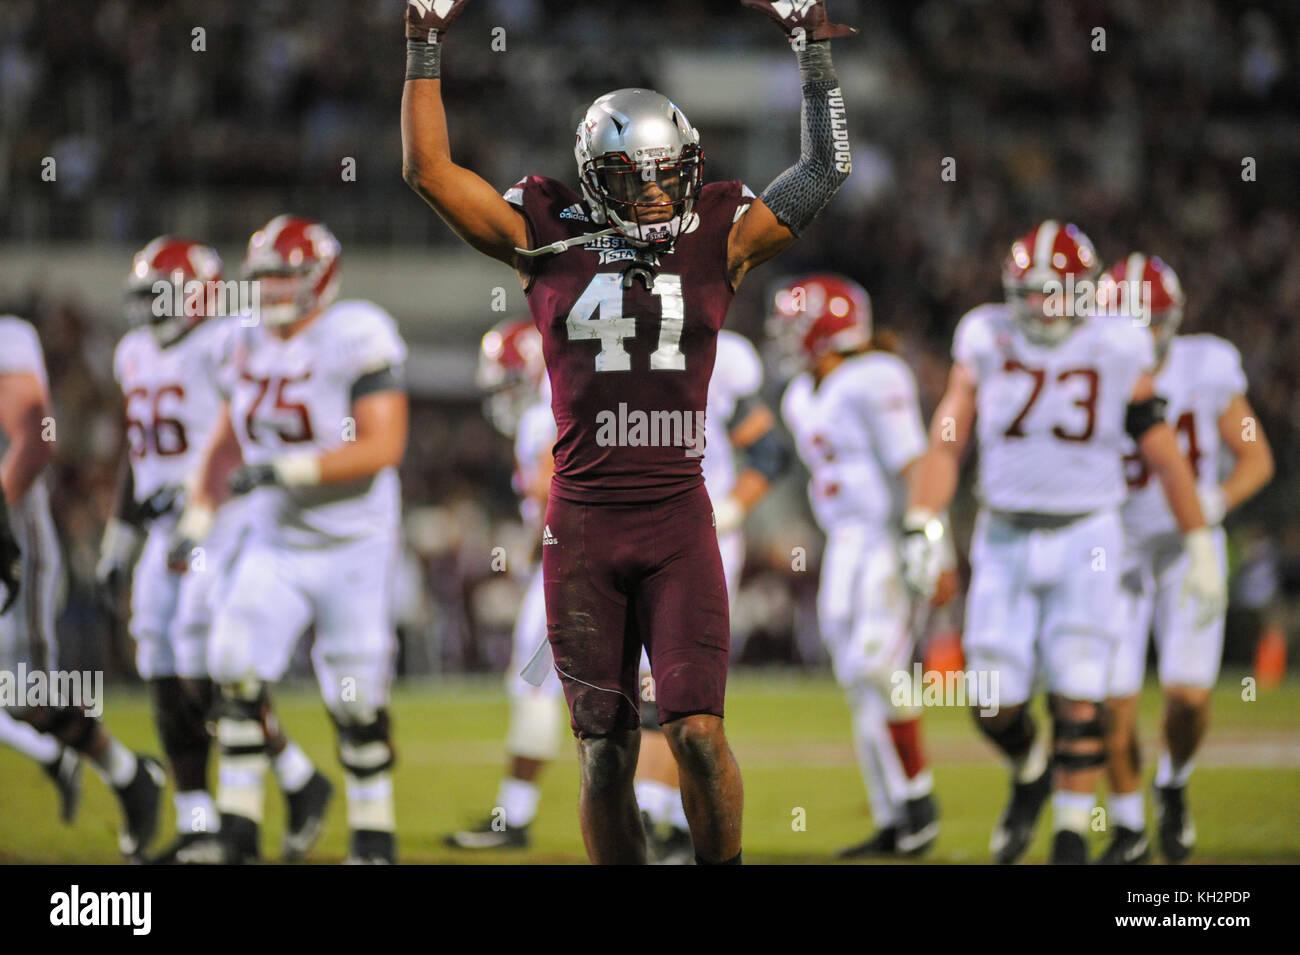 November 11, 2017; Starkville, MS, USA; MSU DB, MARK Mc Laurin (41), celebrates an MSU touchdown during NCAA D1 - Stock Image